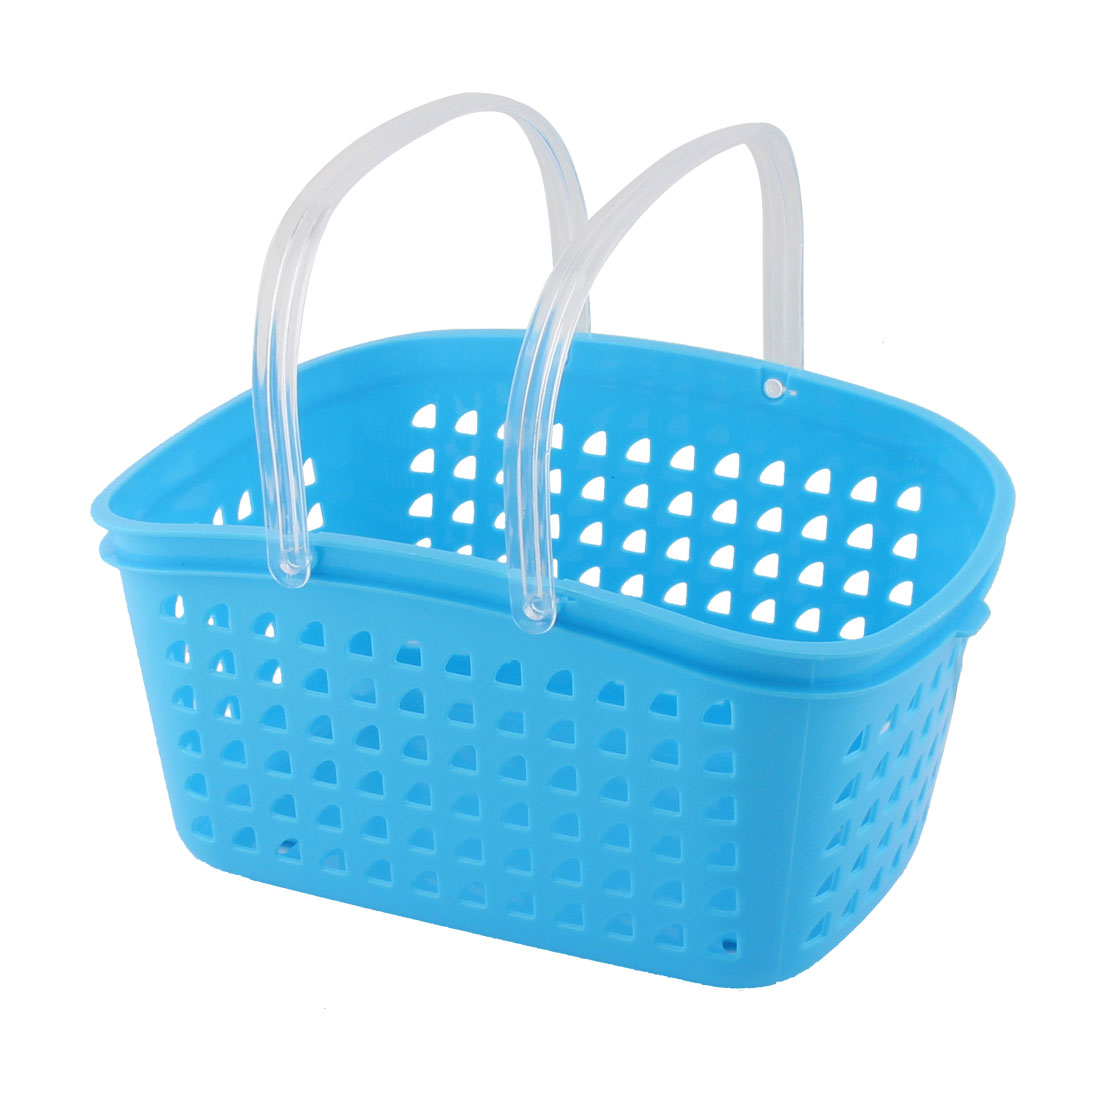 UXCELL Household Bathroom Plastic Portable Shower Gel Soap Storage ...